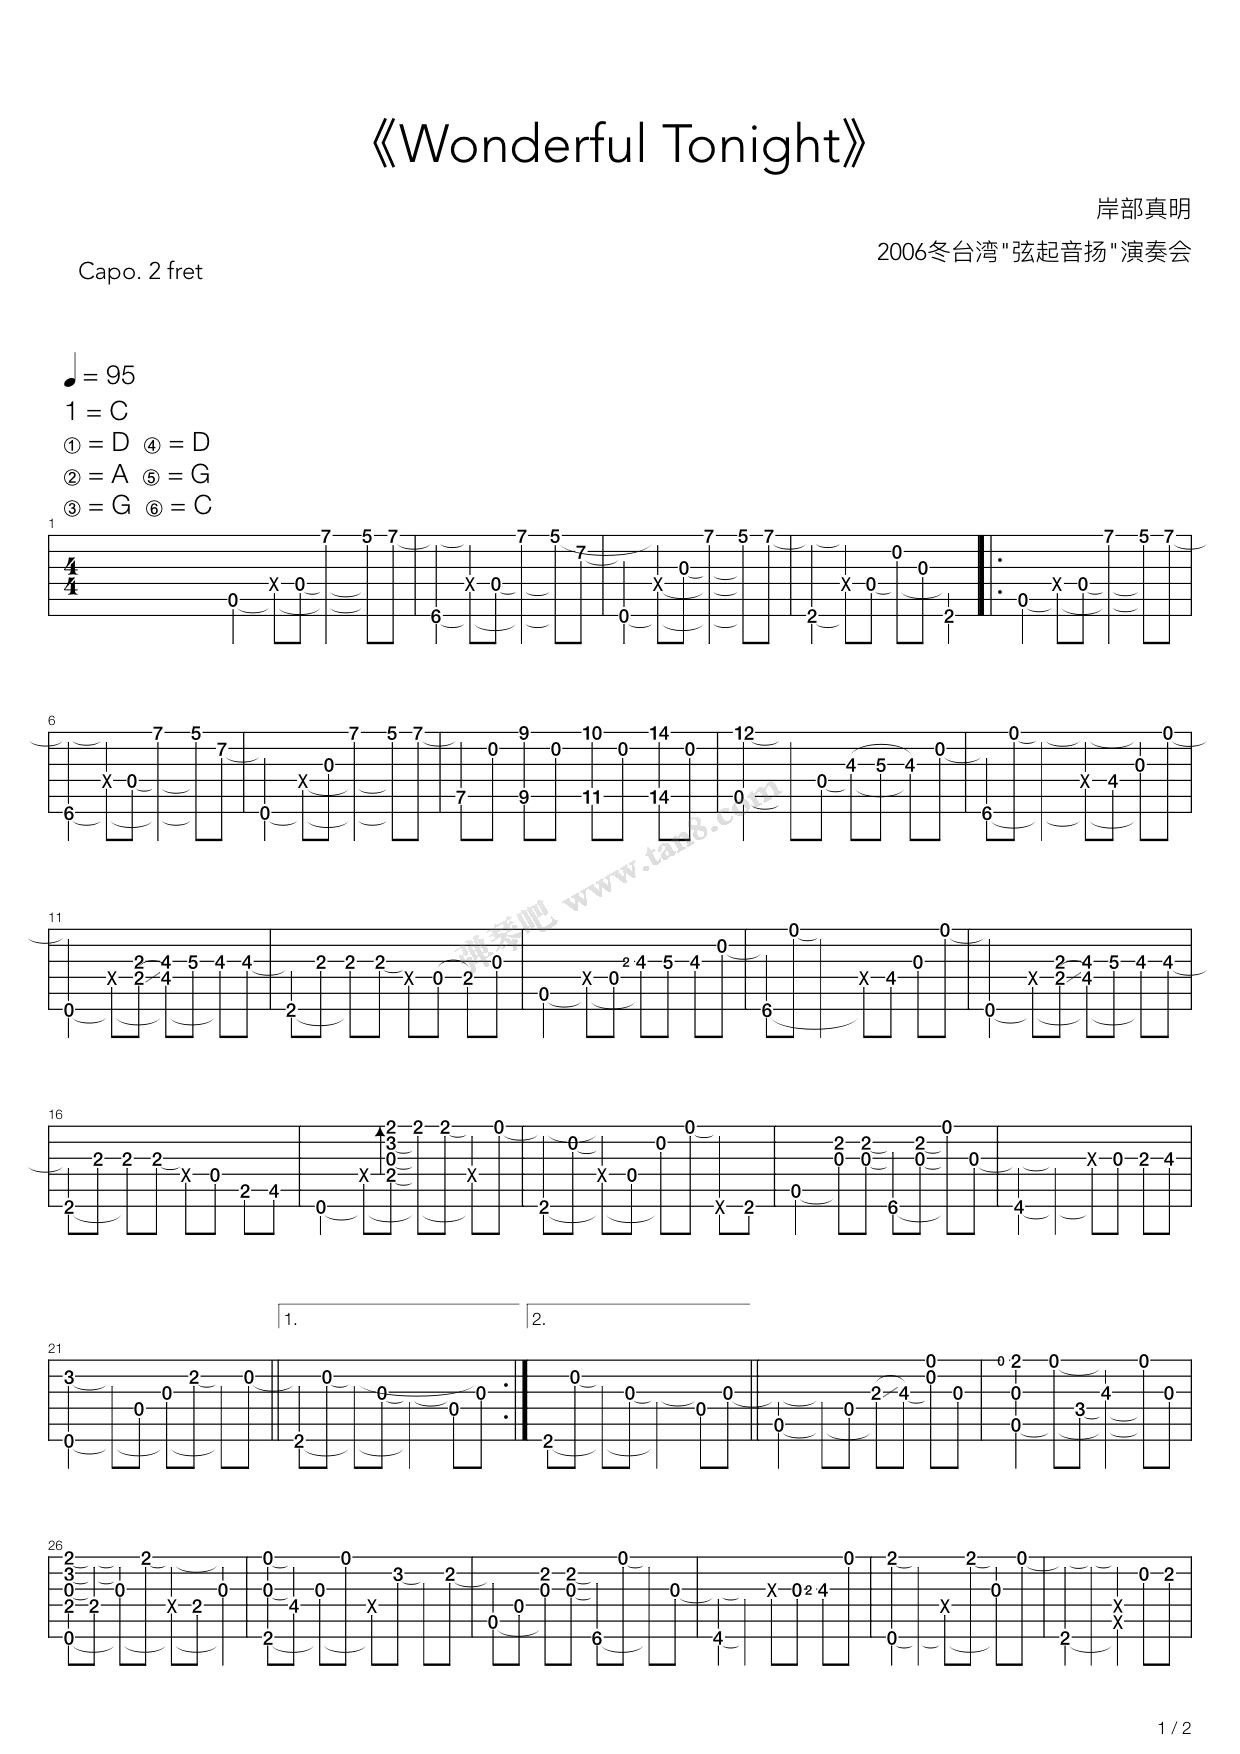 Wonderful Tonight By Masaaki Kishibe Guitar Tabs Chords Sheet Music